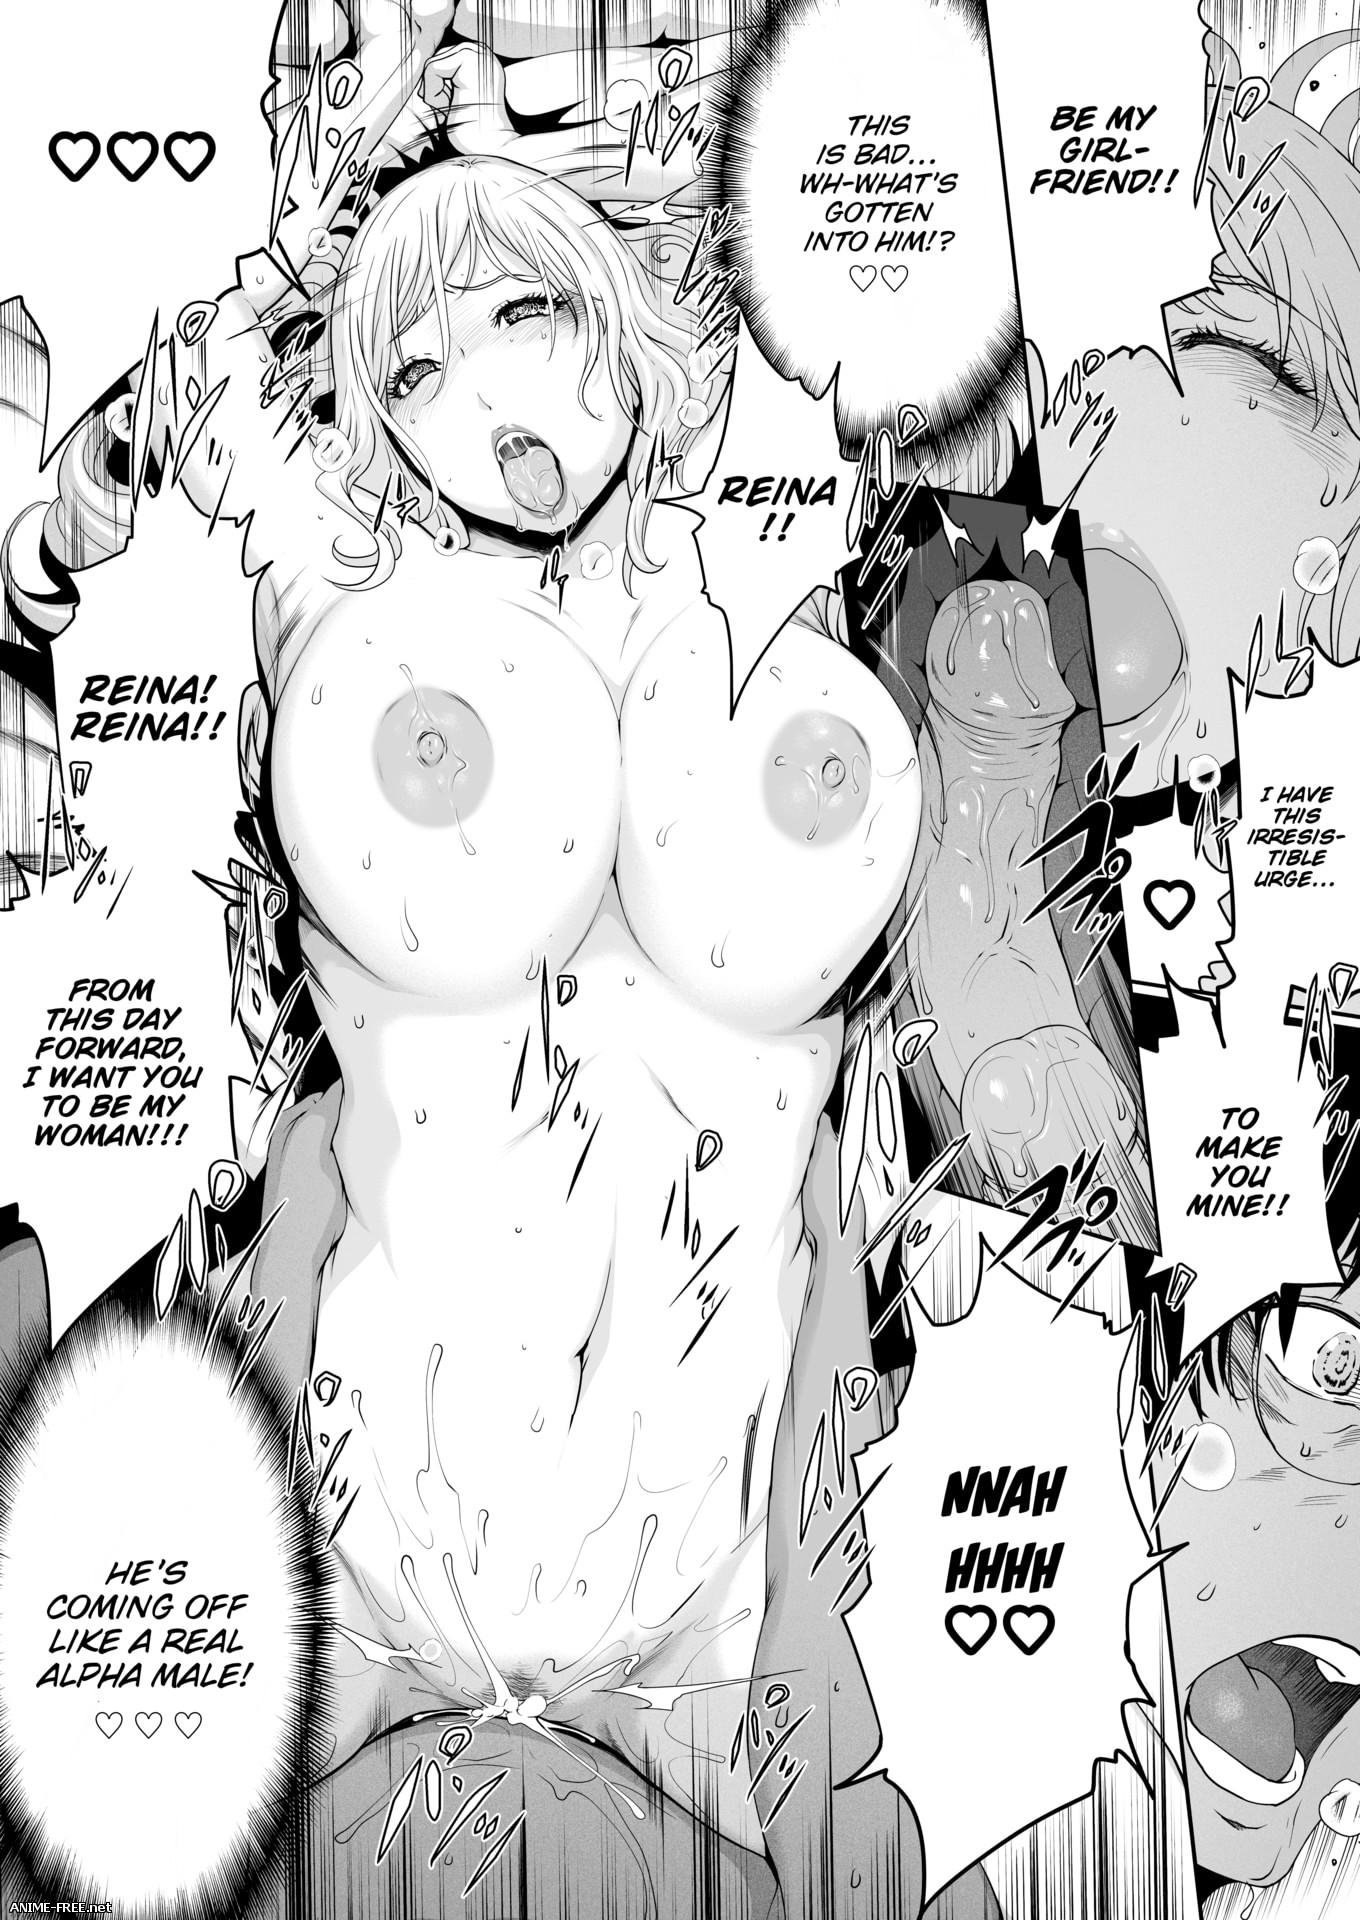 Fakku (Collection 2) - Сборник хентай манги (Часть - 2) [Uncen] [ENG] Manga Hentai